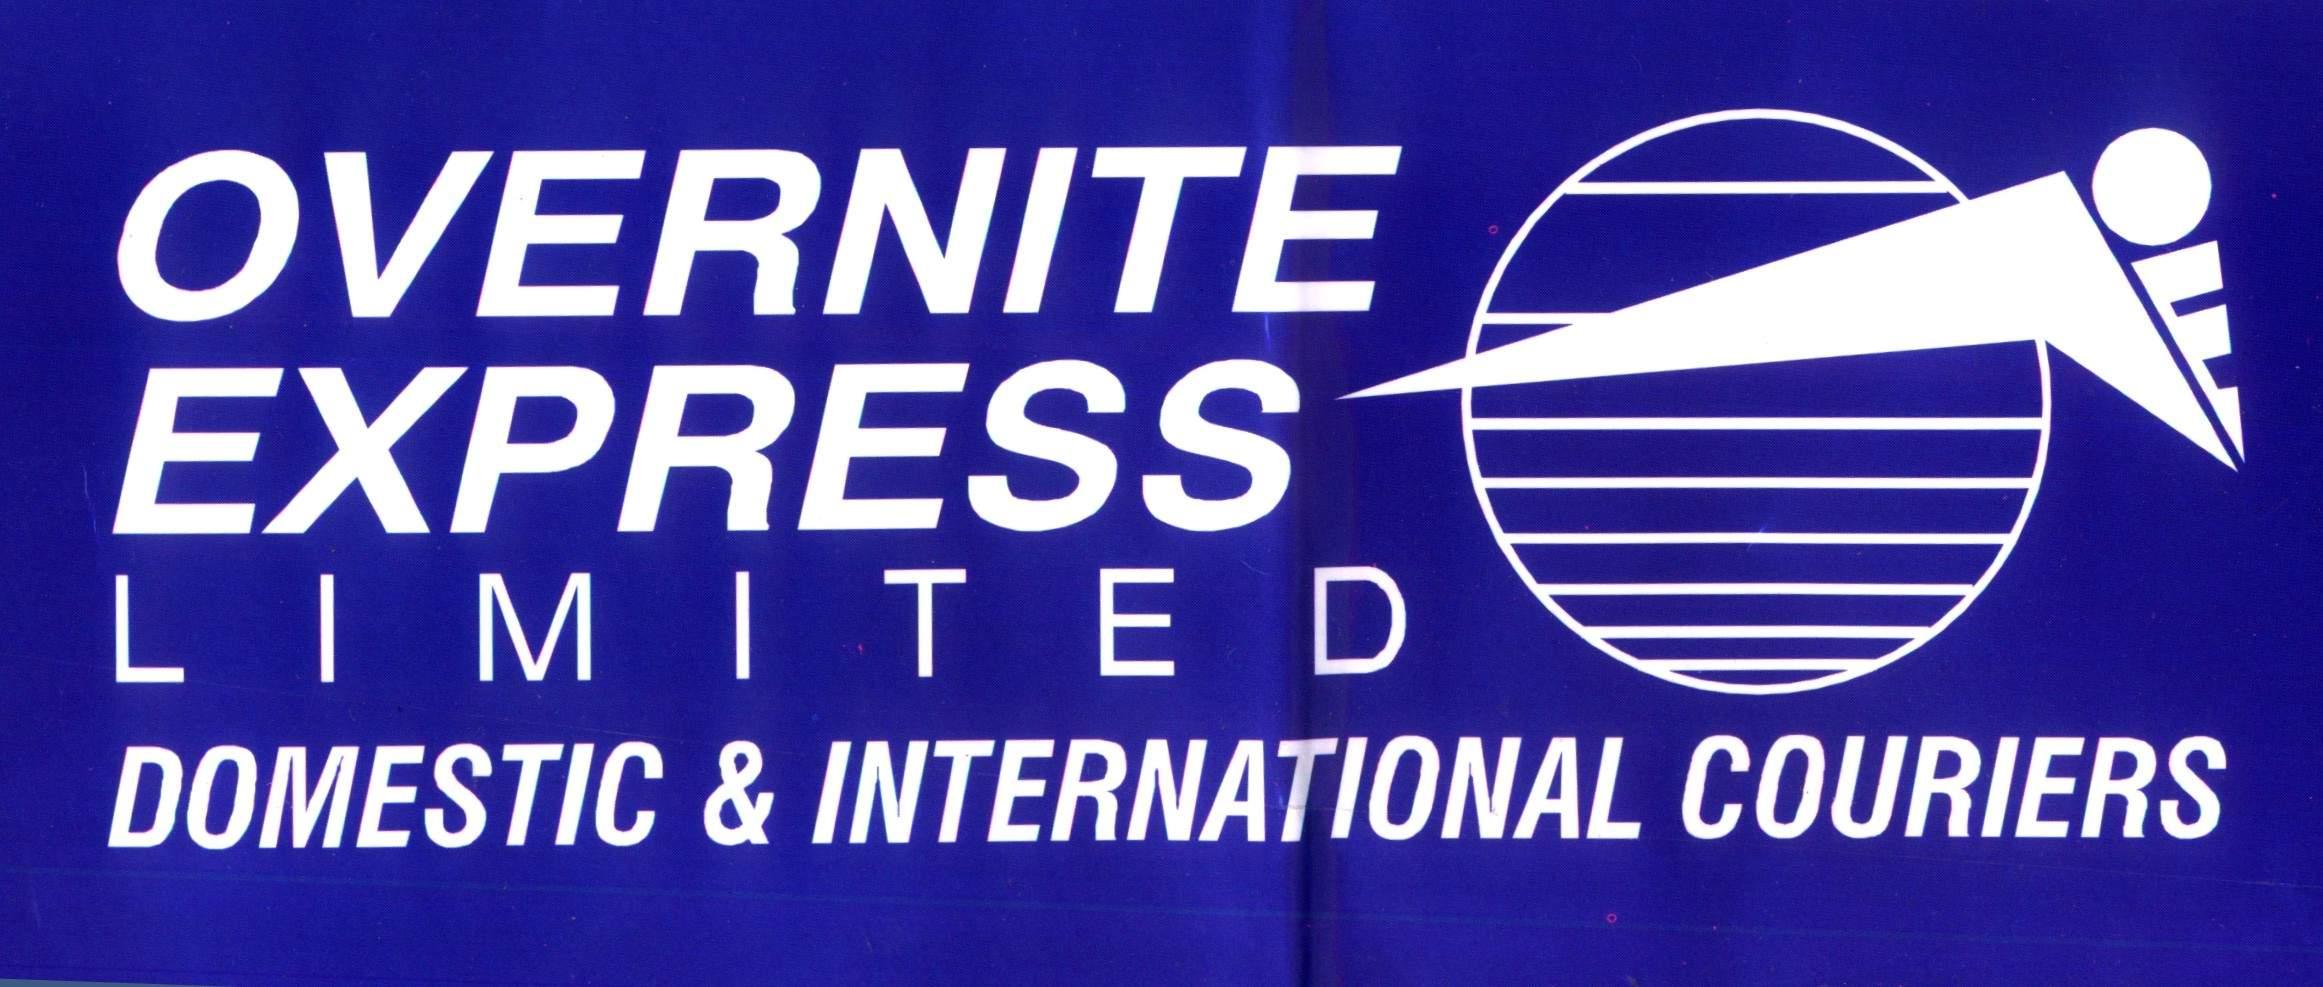 Overnite Express - Goa Image